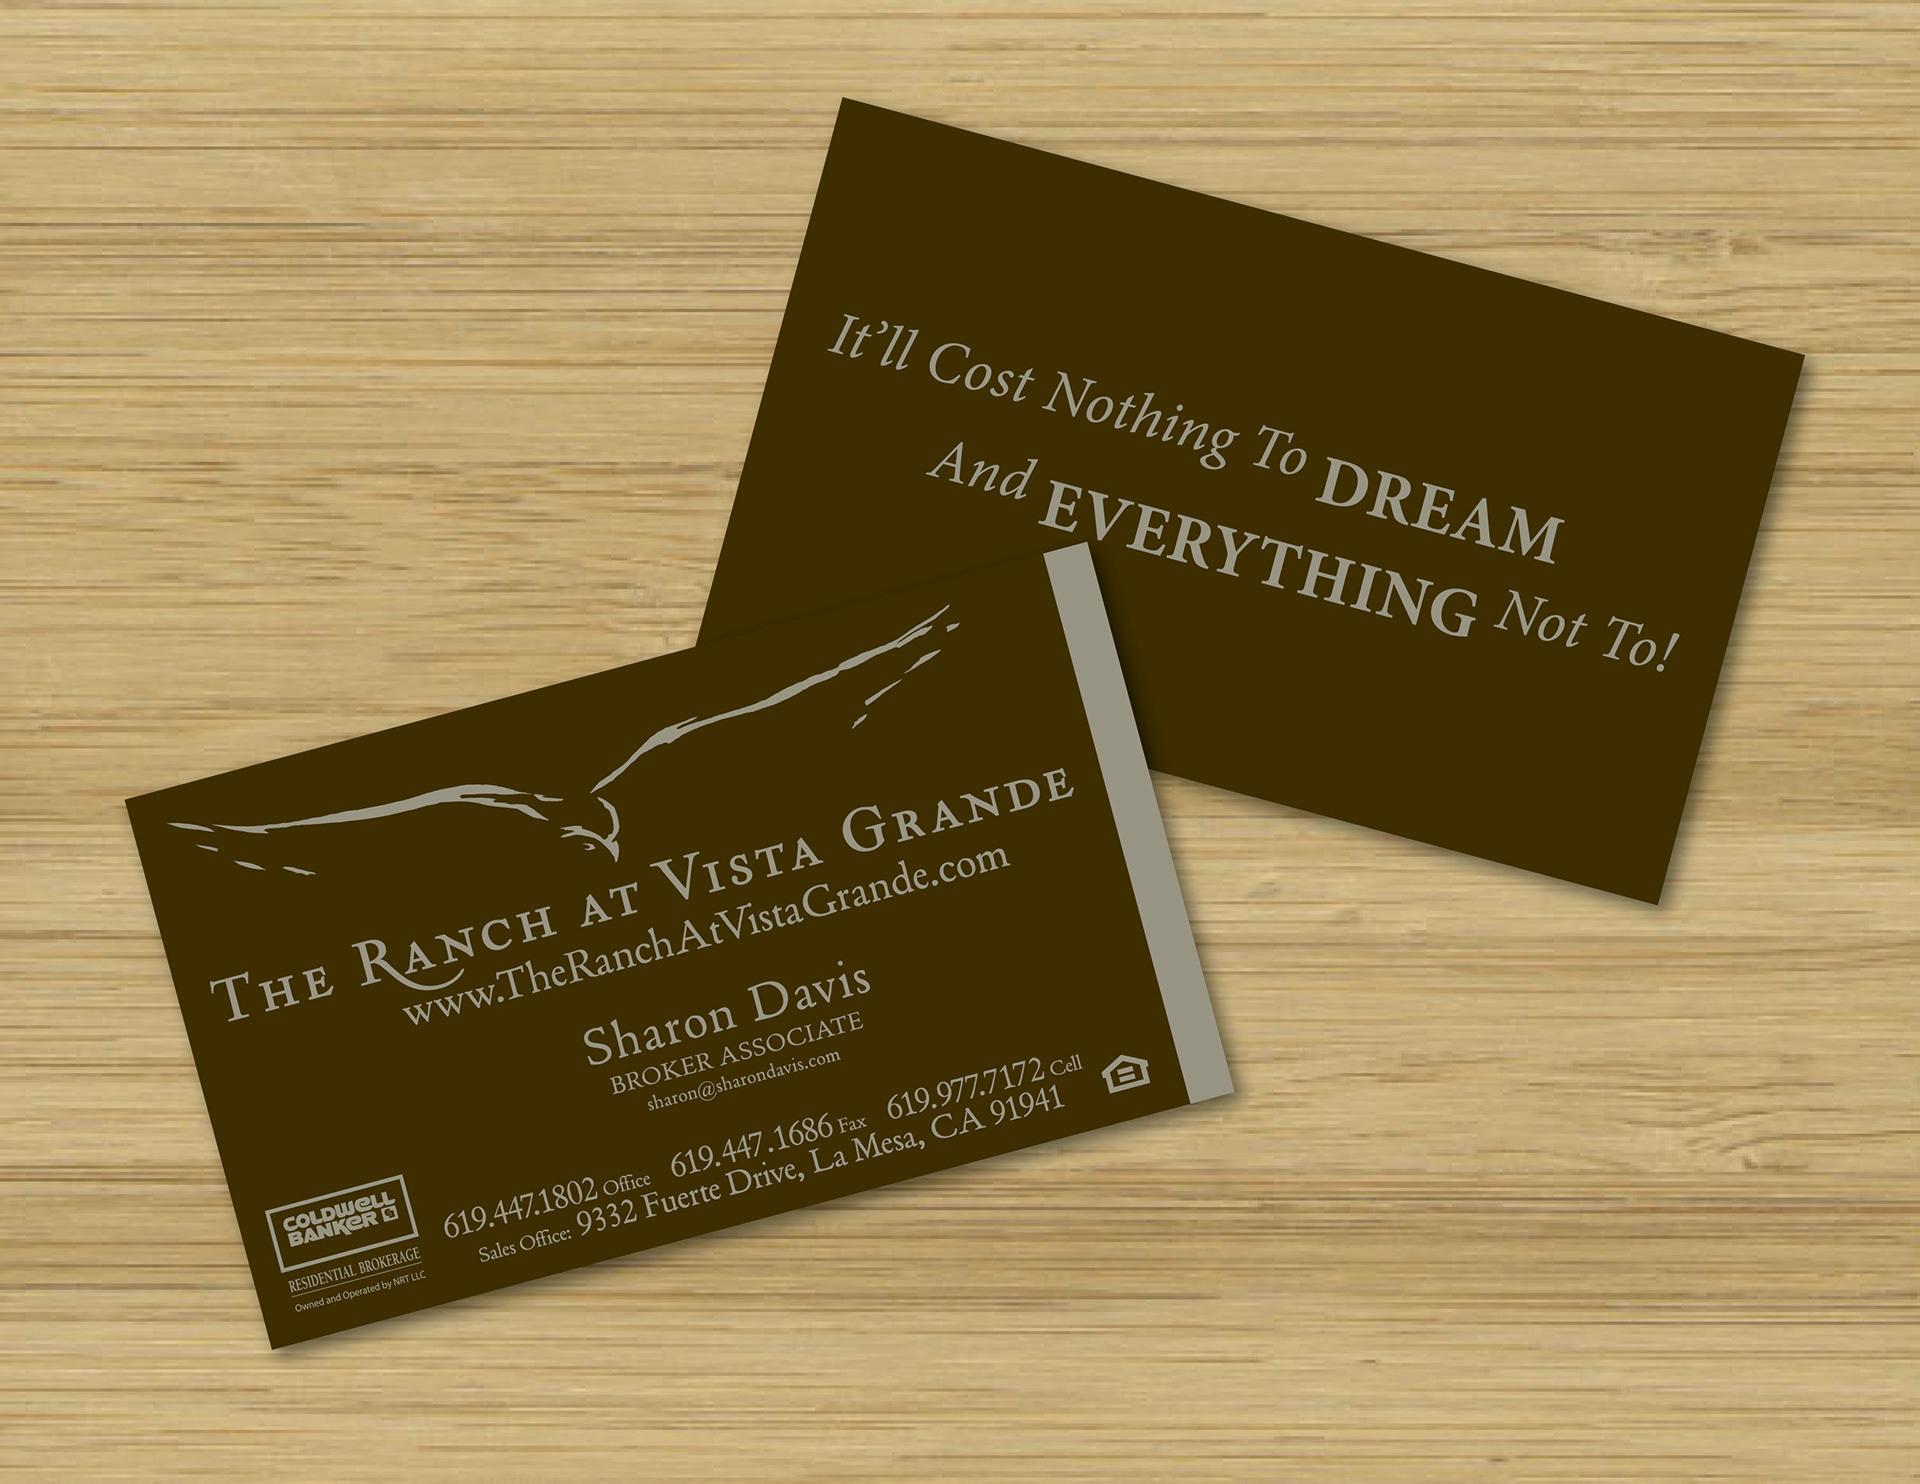 susan duffett - LETTERHEAD and BUSINESS CARDS